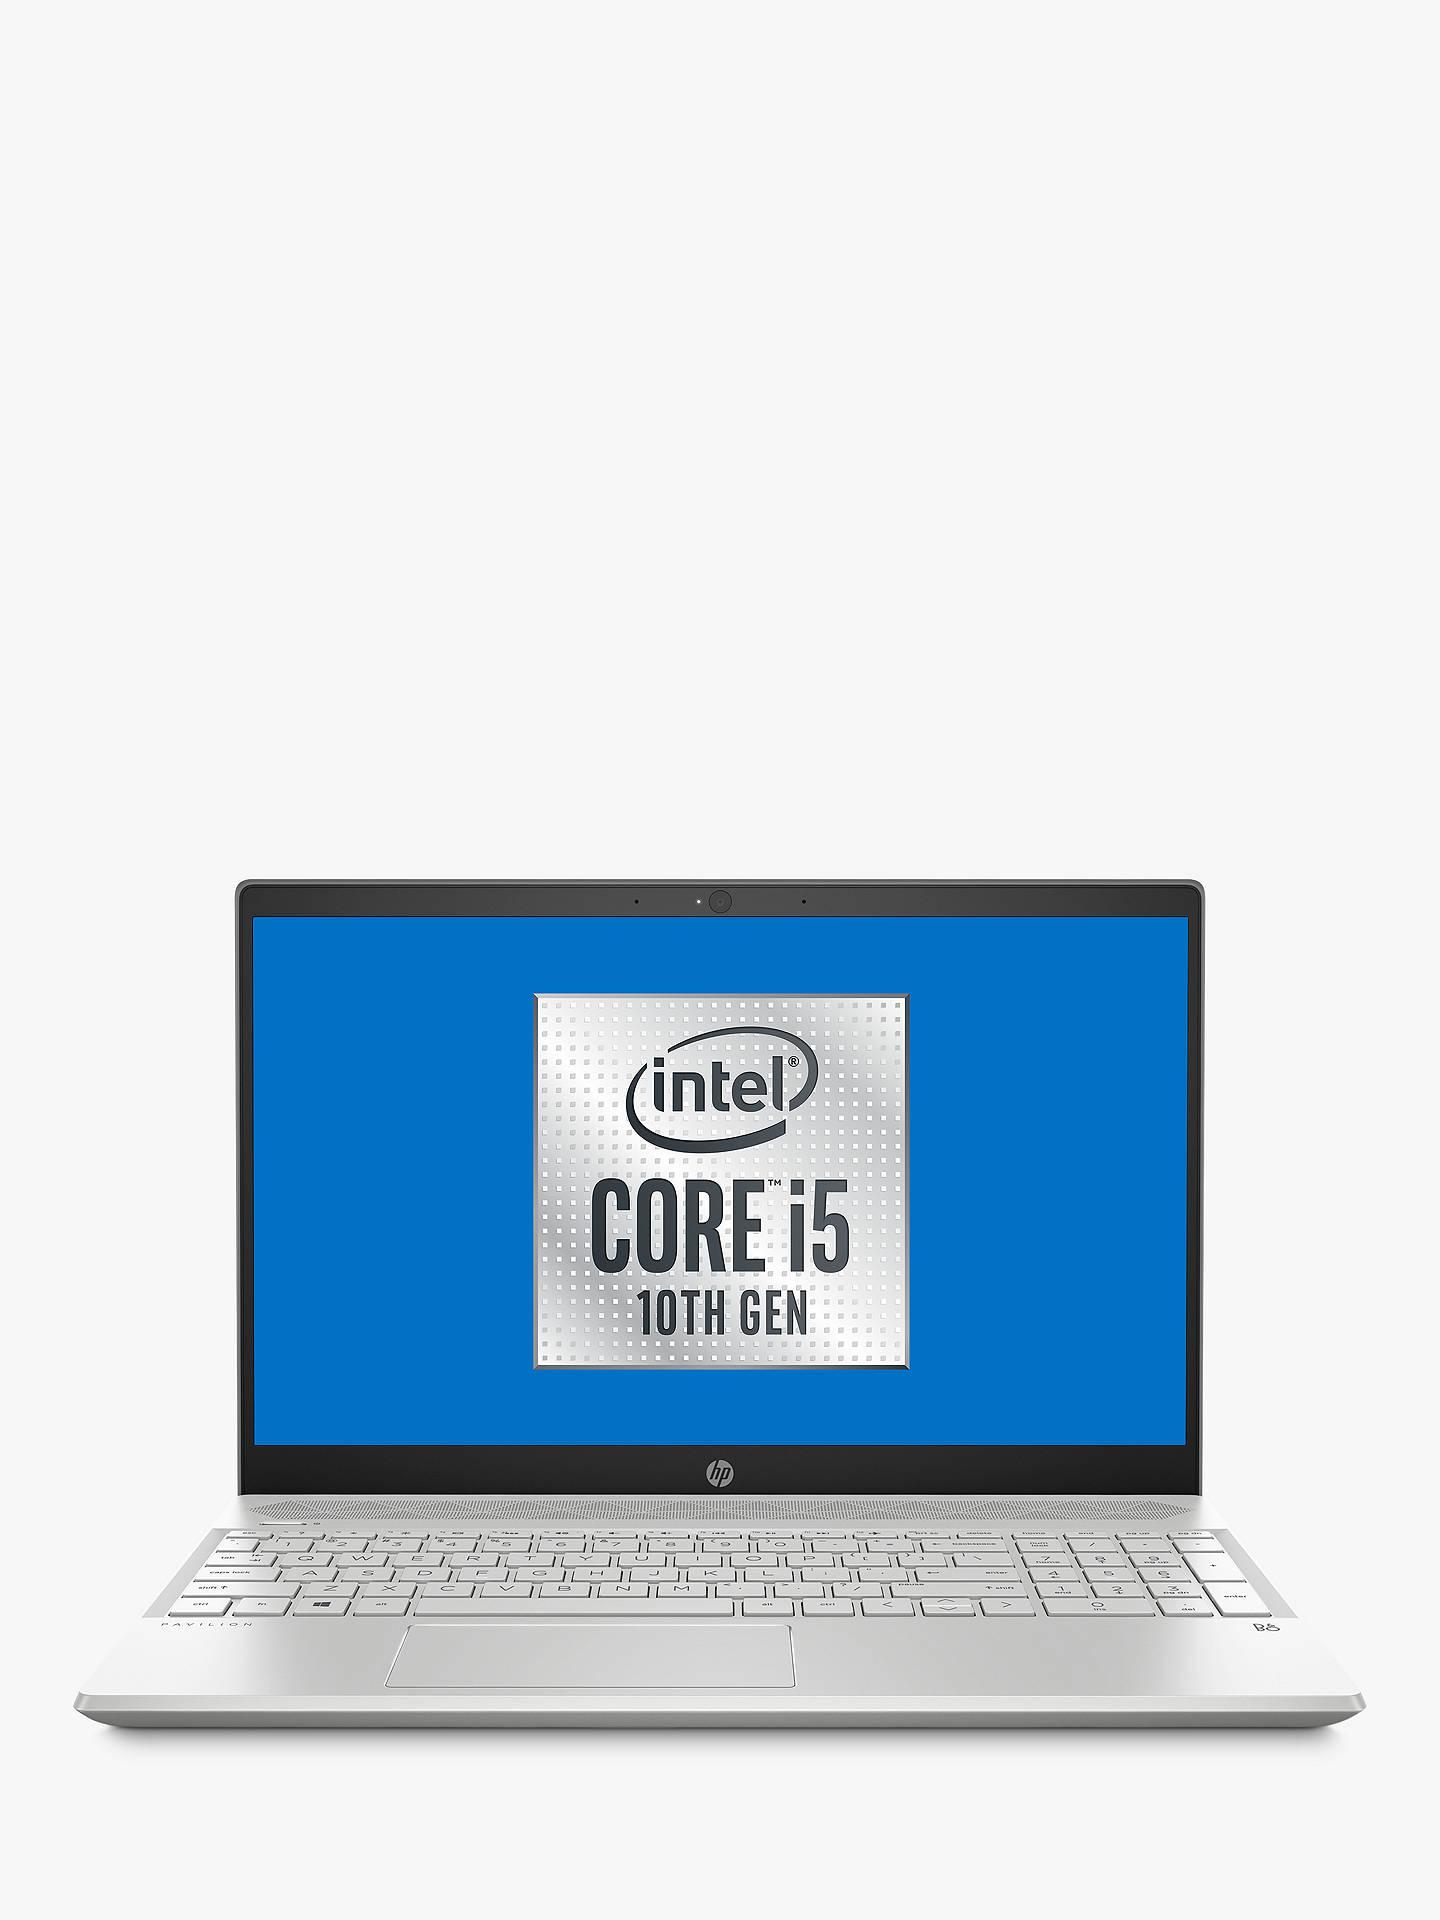 Hp Pavilion 15 Cs3001na Laptop Intel Core I5 Processor 8gb Ram 512gb Ssd 15 6 Full Hd Mineral Silver At John Lewis Partners